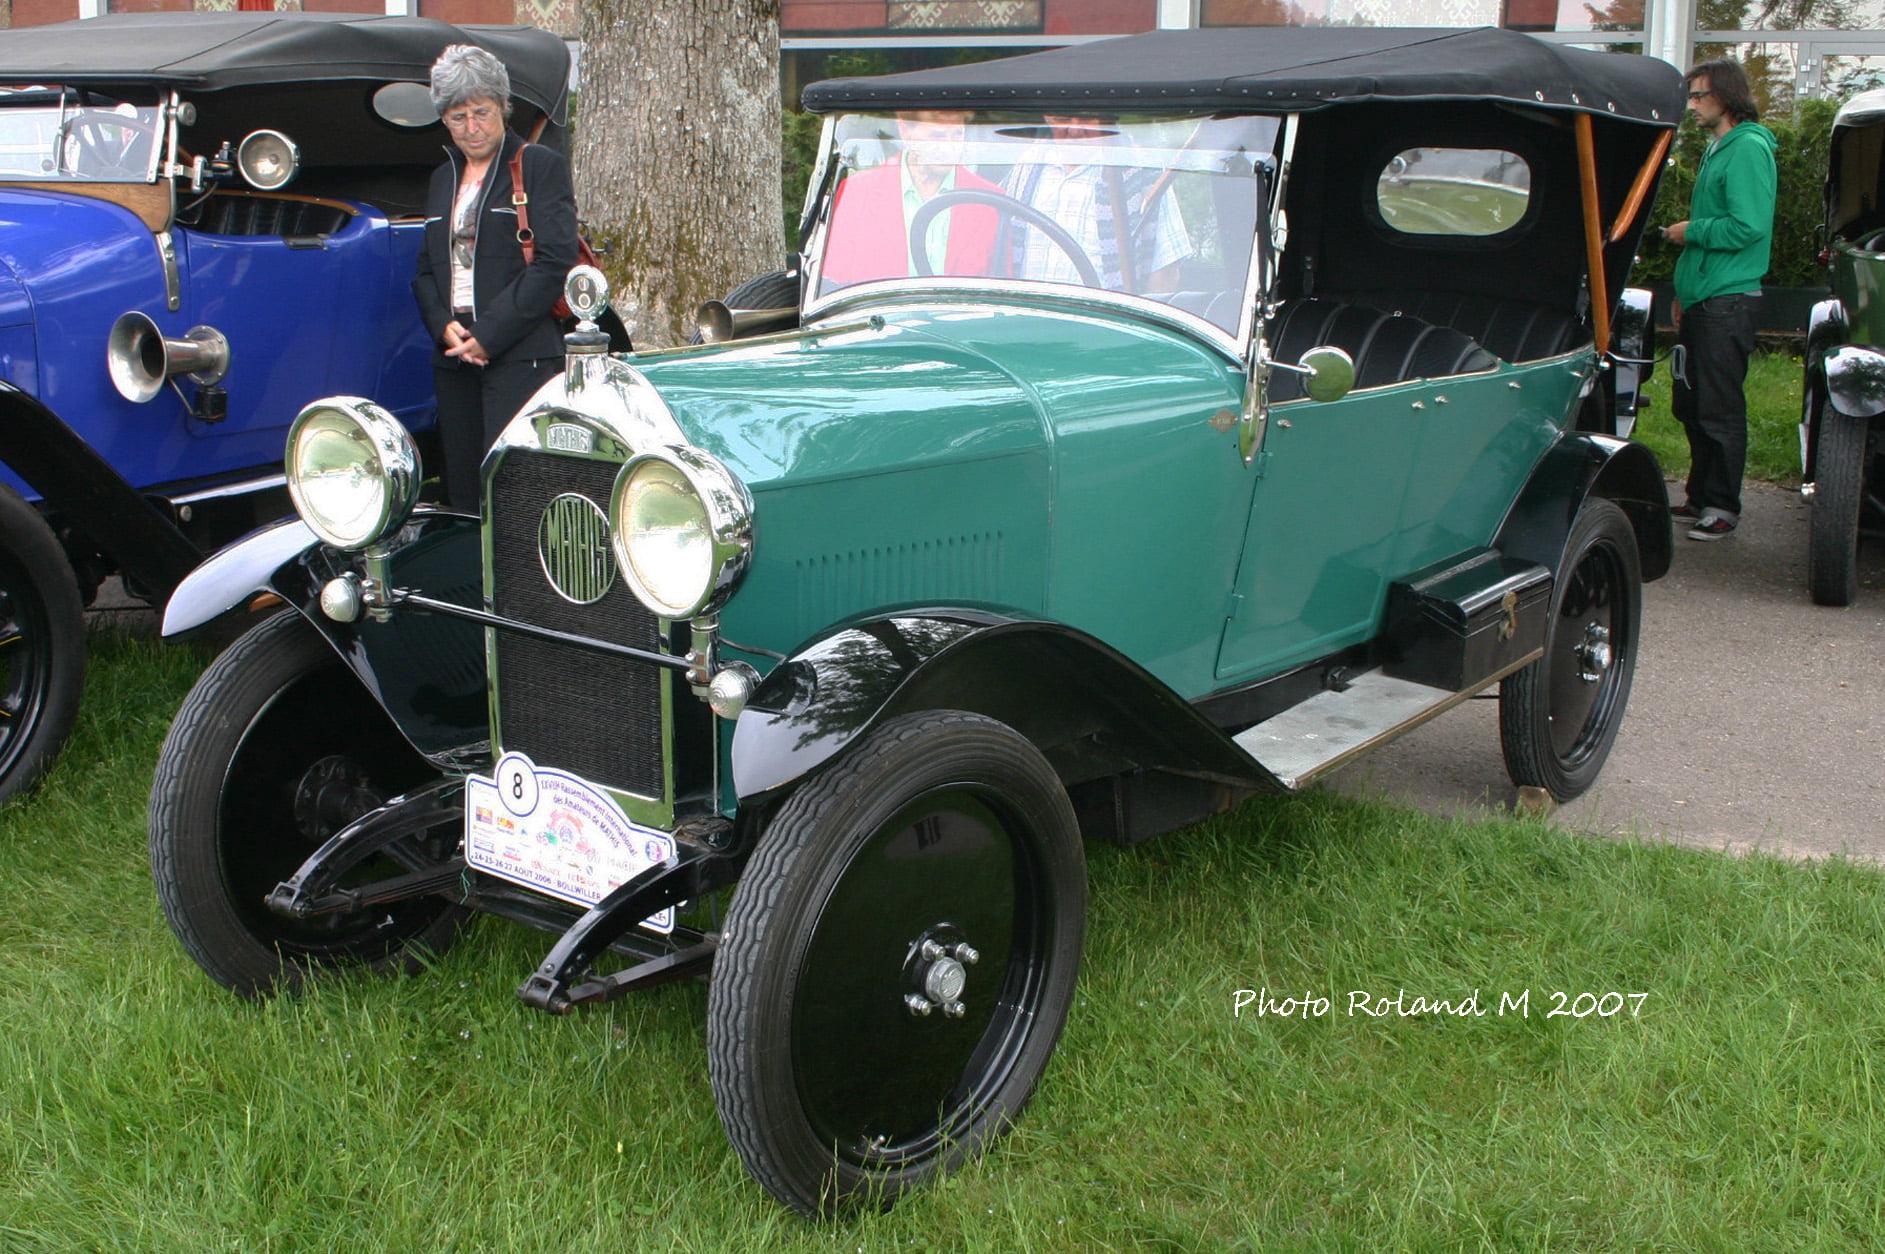 Mathis-type-P-torpedo-1922--Retro-Vosgien-Club-Retro-Vosgien-in-Gerardmer--88--in-2007-(3)